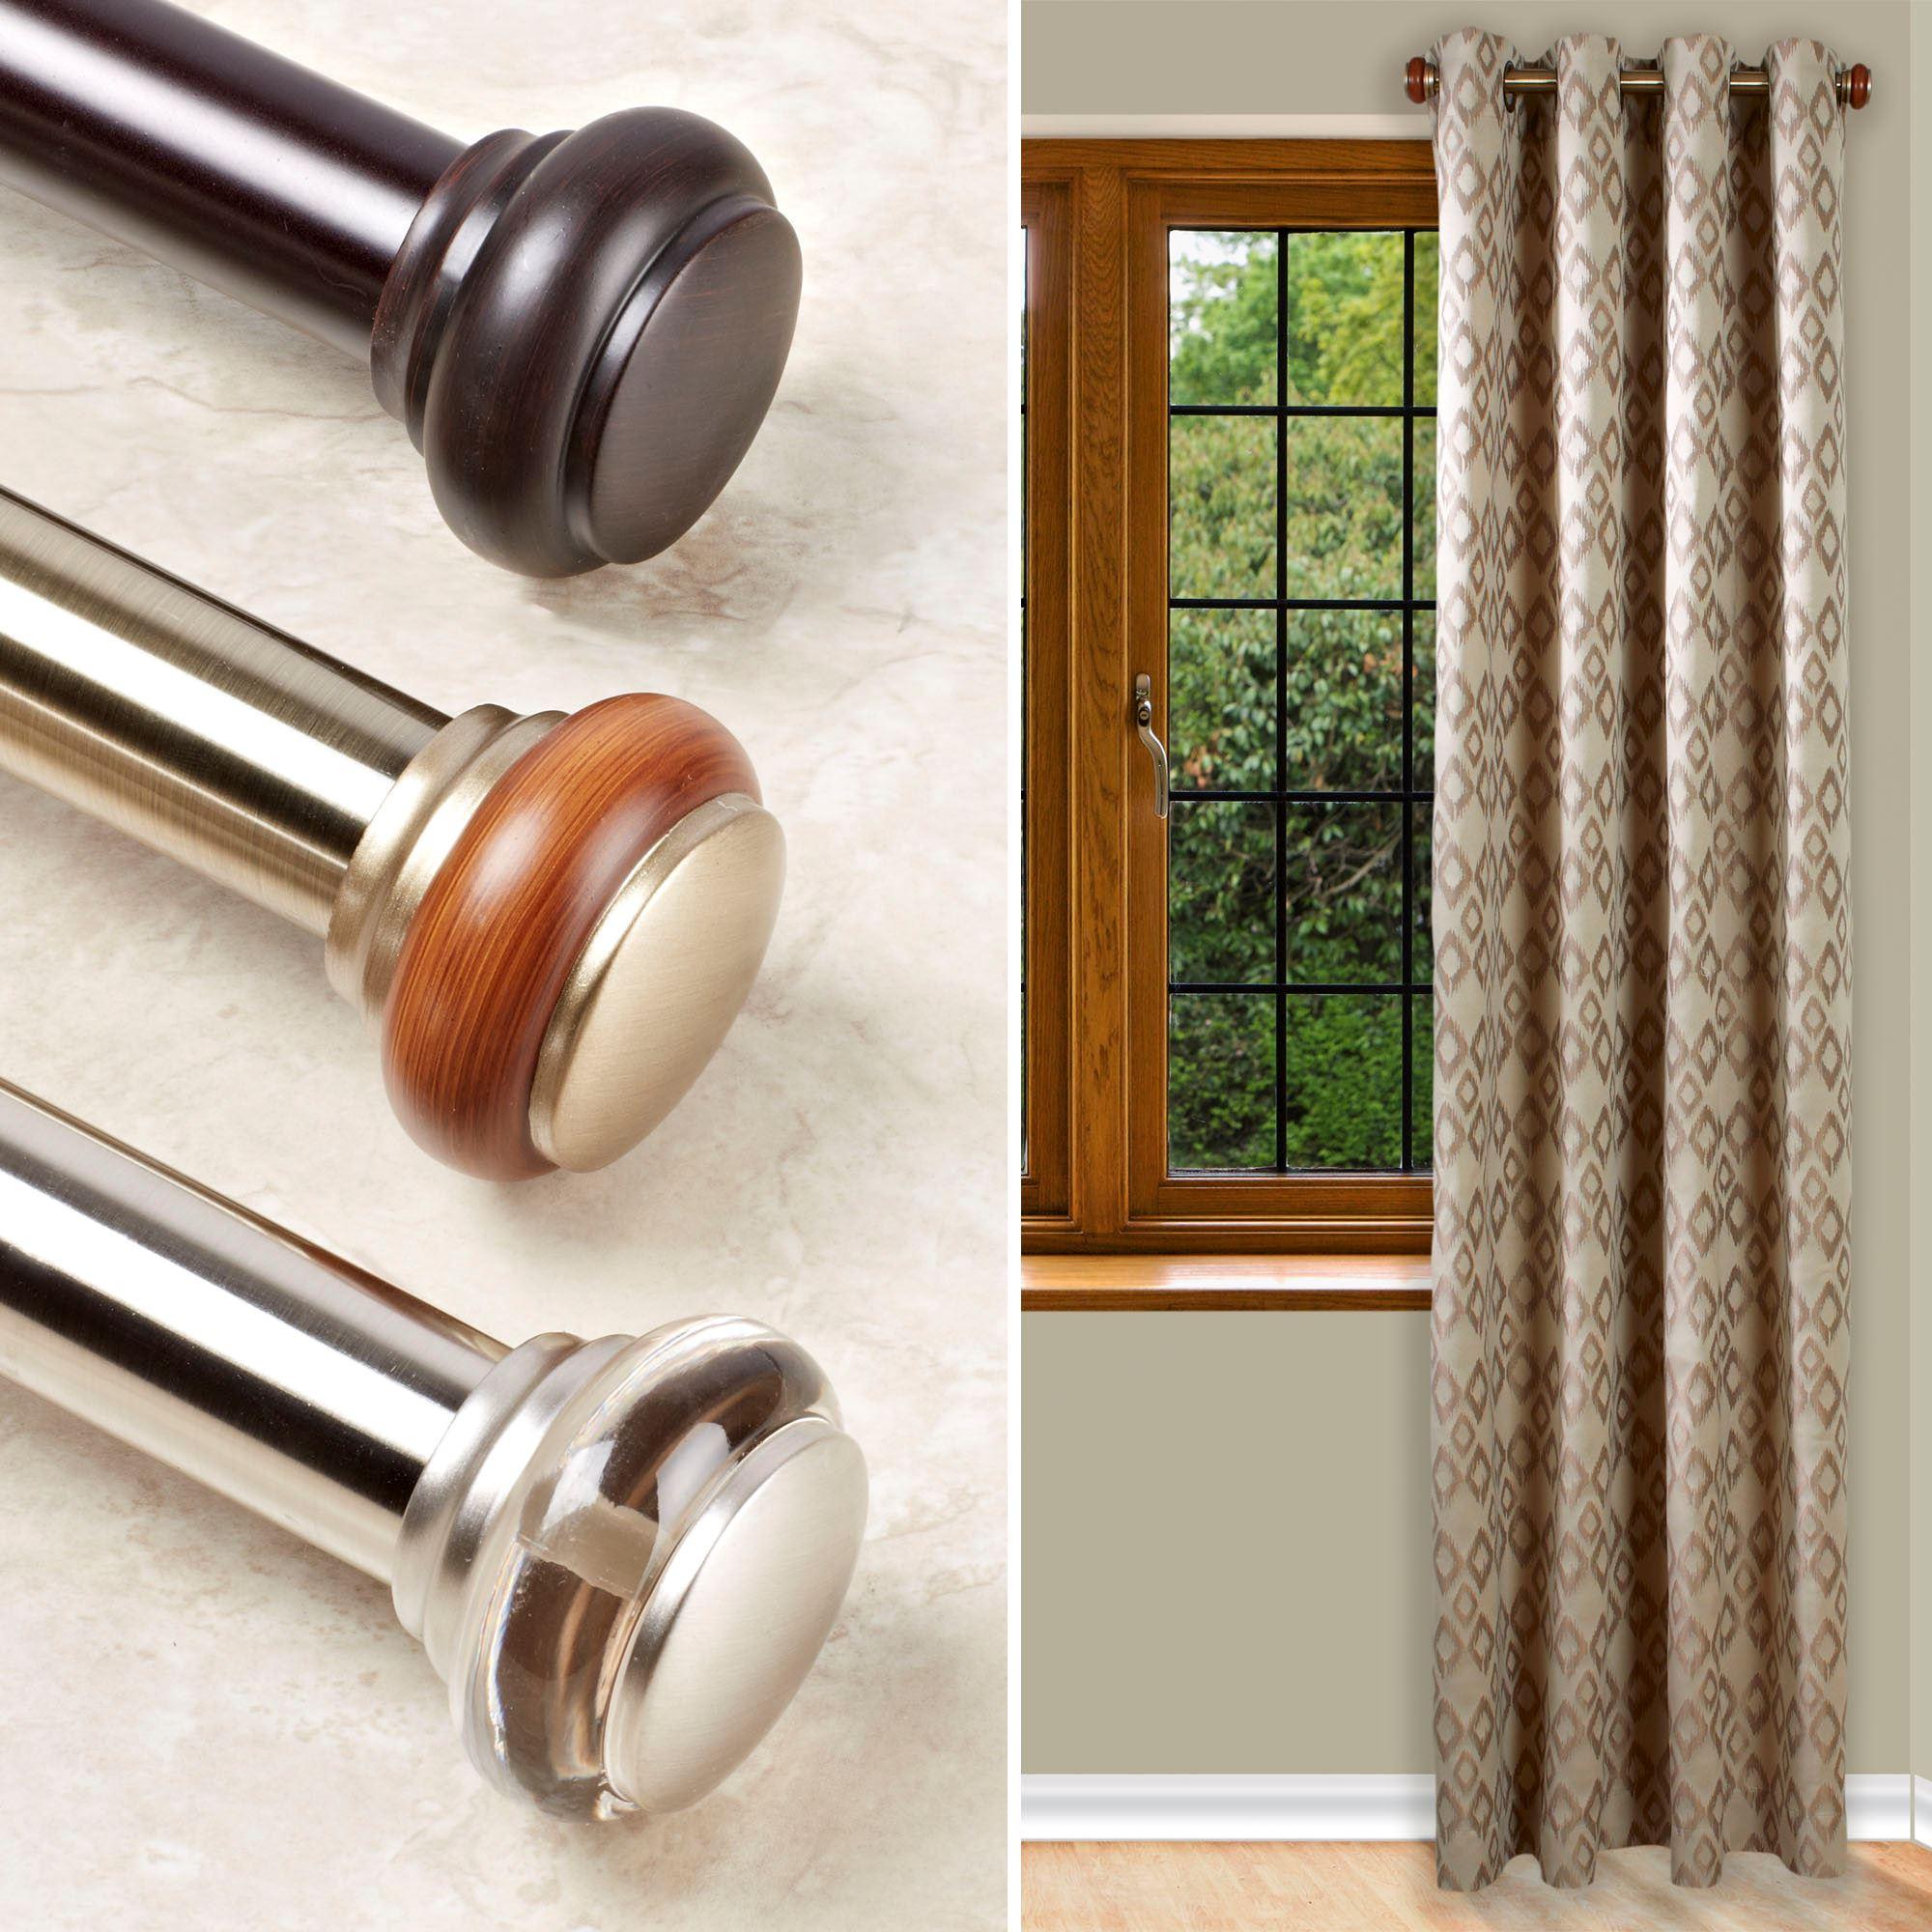 Short Decorative Curtain Rods 12